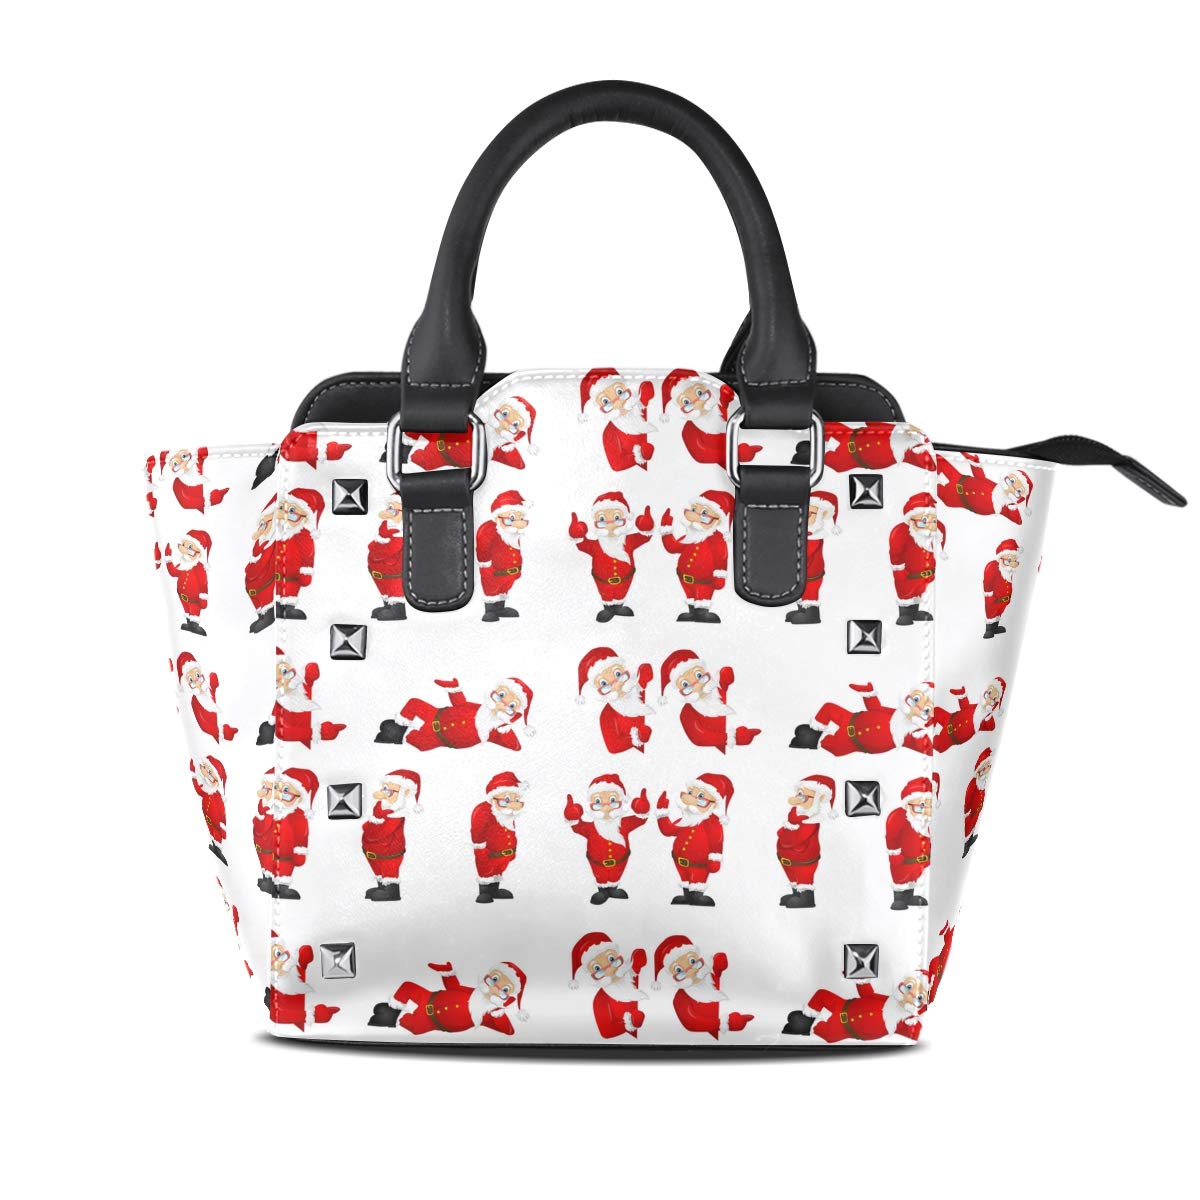 Funny And Santa Claus Womens fashion Handbags Shoulder Bags Handle Satchel